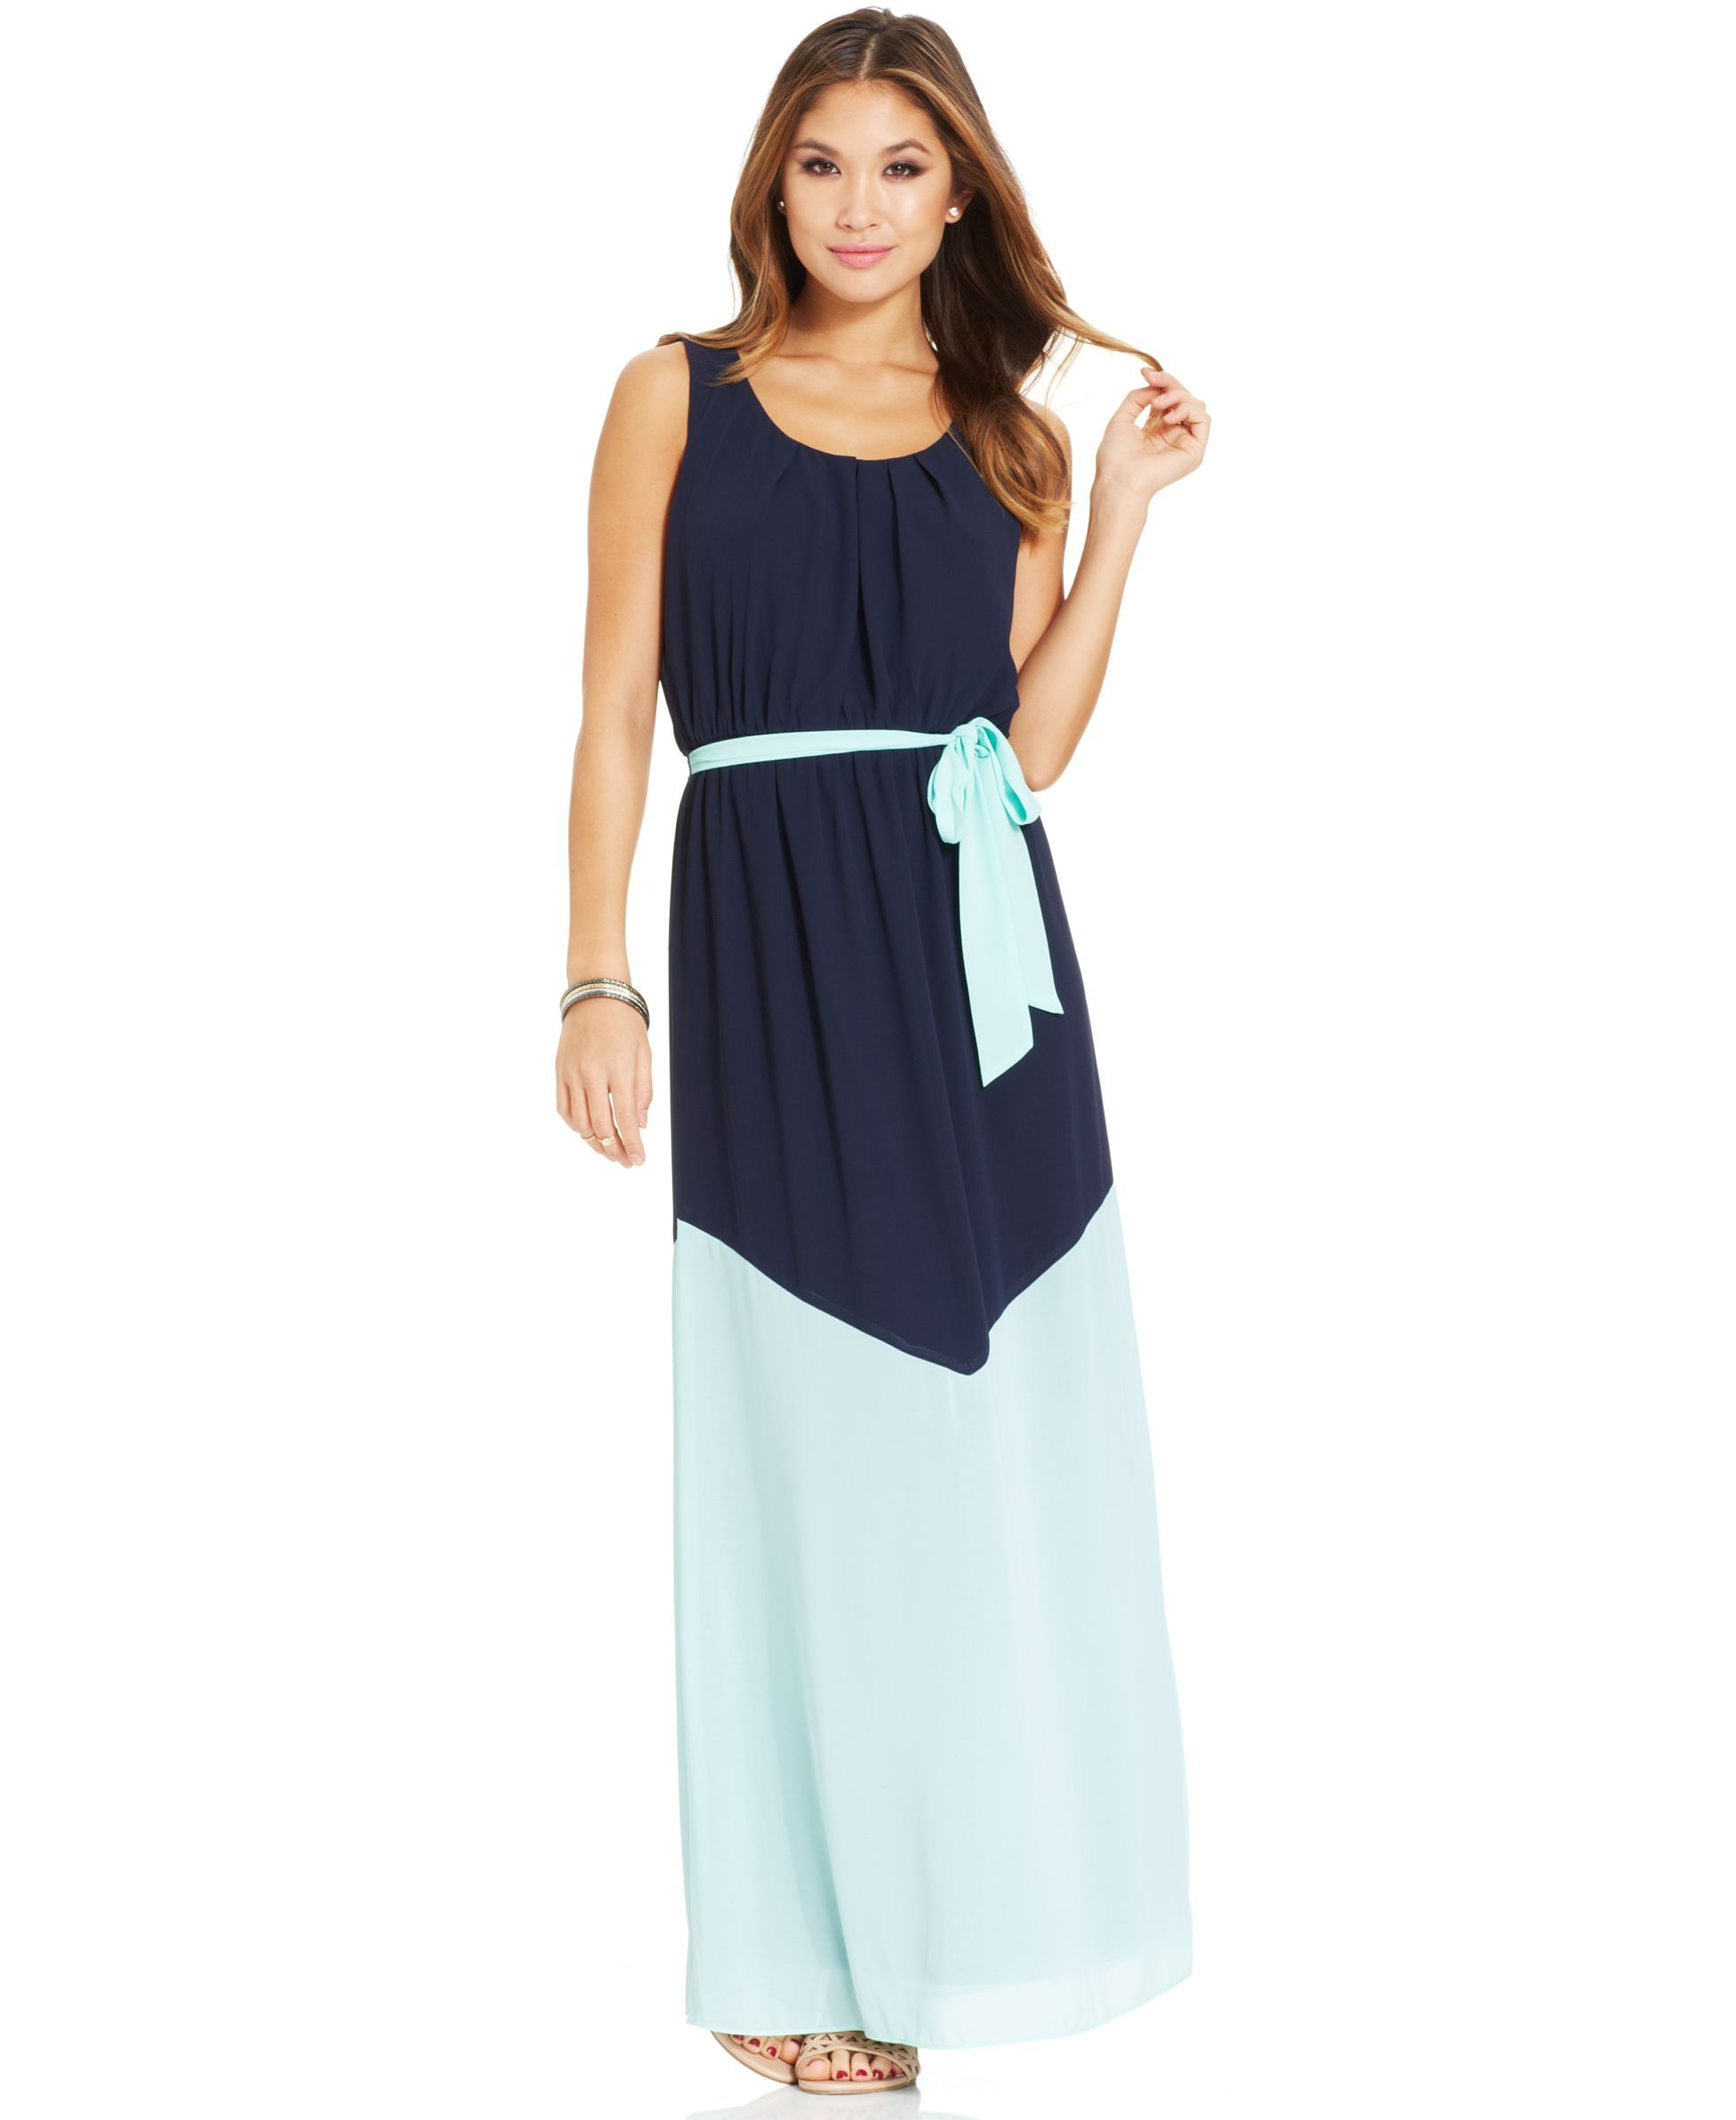 Bcx Juniorsu Colorblock Maxi Dress Products Pinterest Products